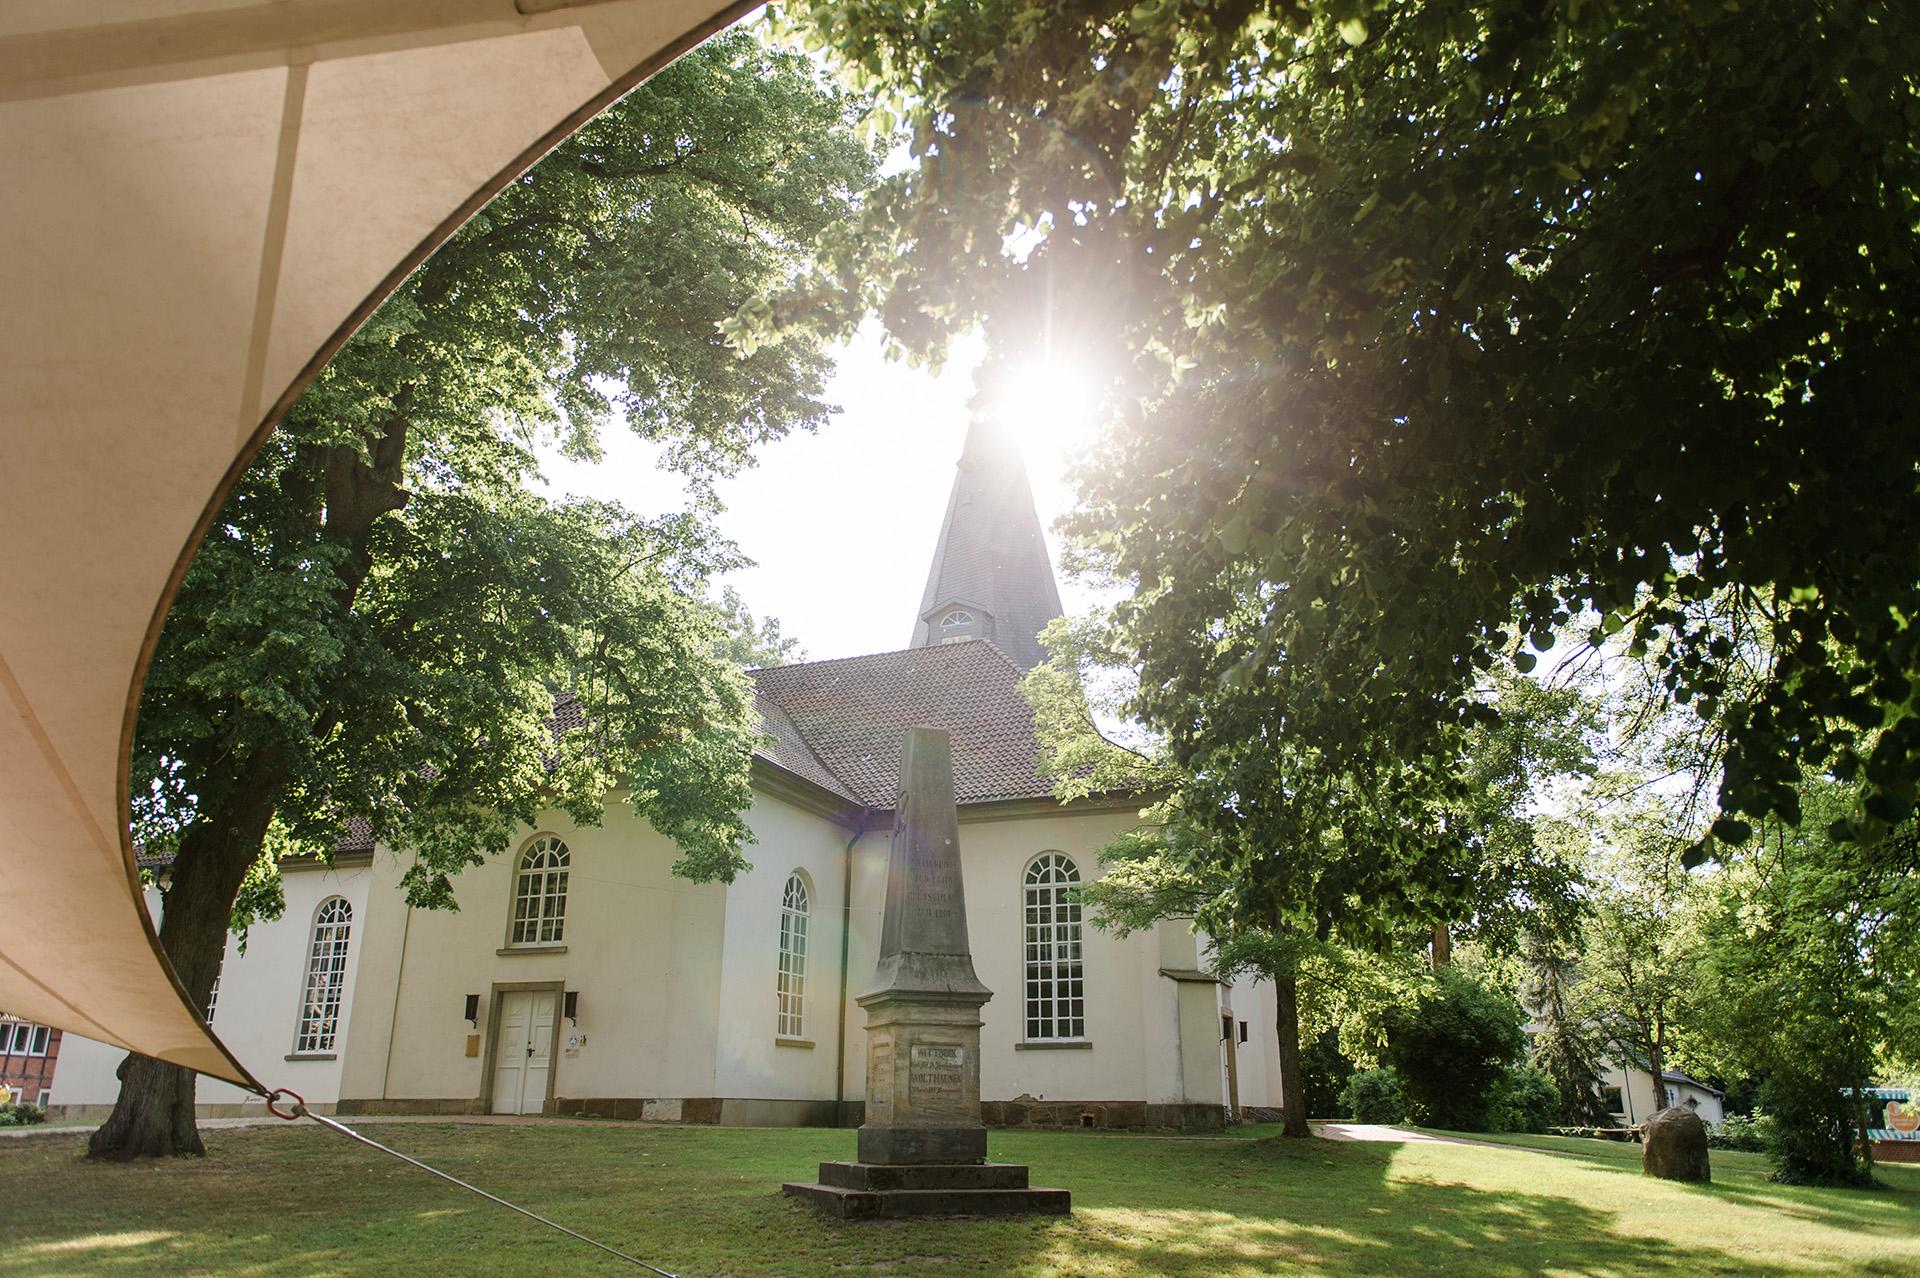 Campingpark Südheide, Ausflüge, Radtour, Winsen Aller, Kirche